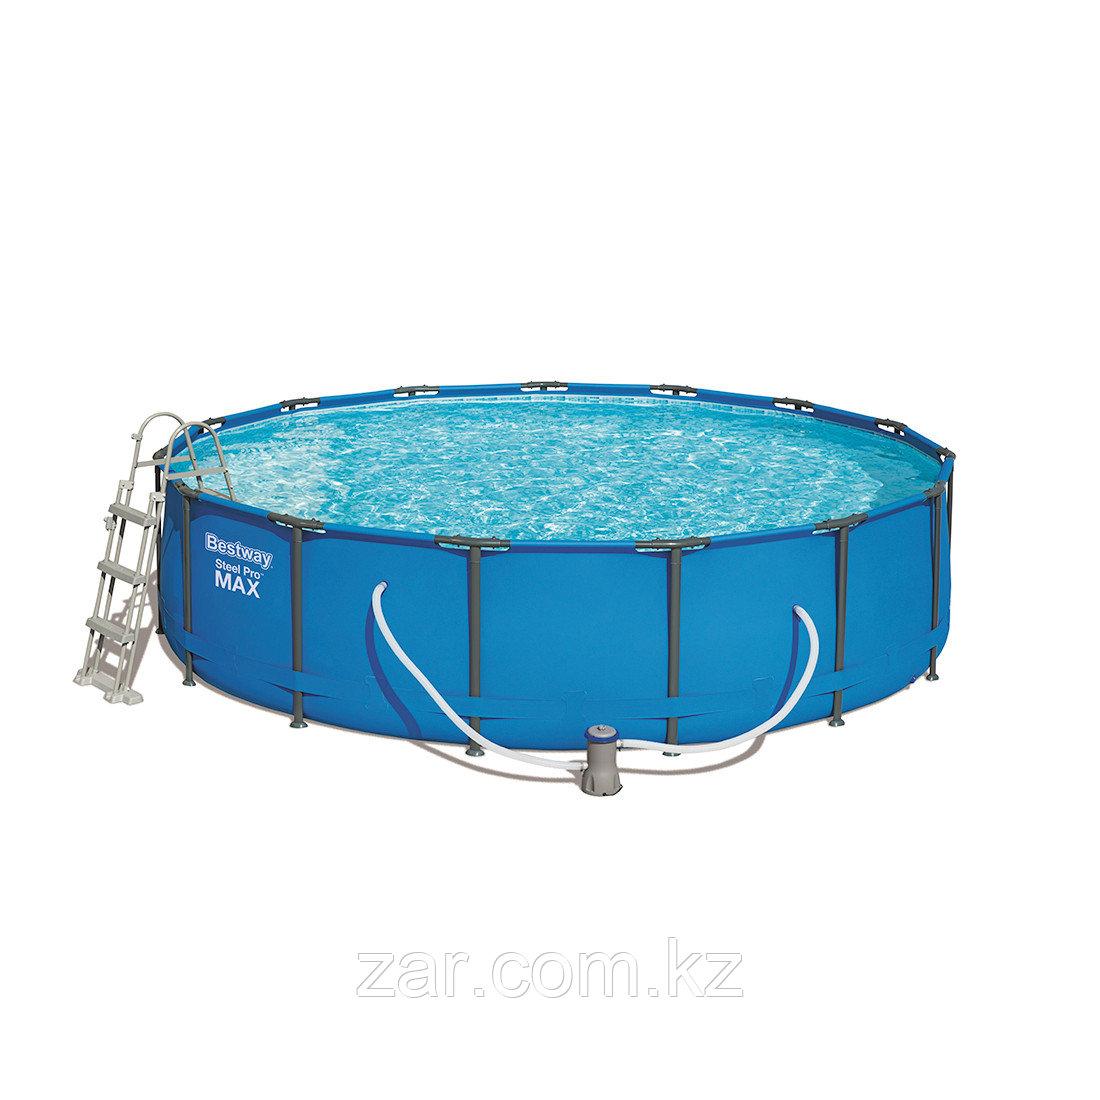 Каркасный бассейн Bestway 56488, Steel Pro MAX 457 х 107 см